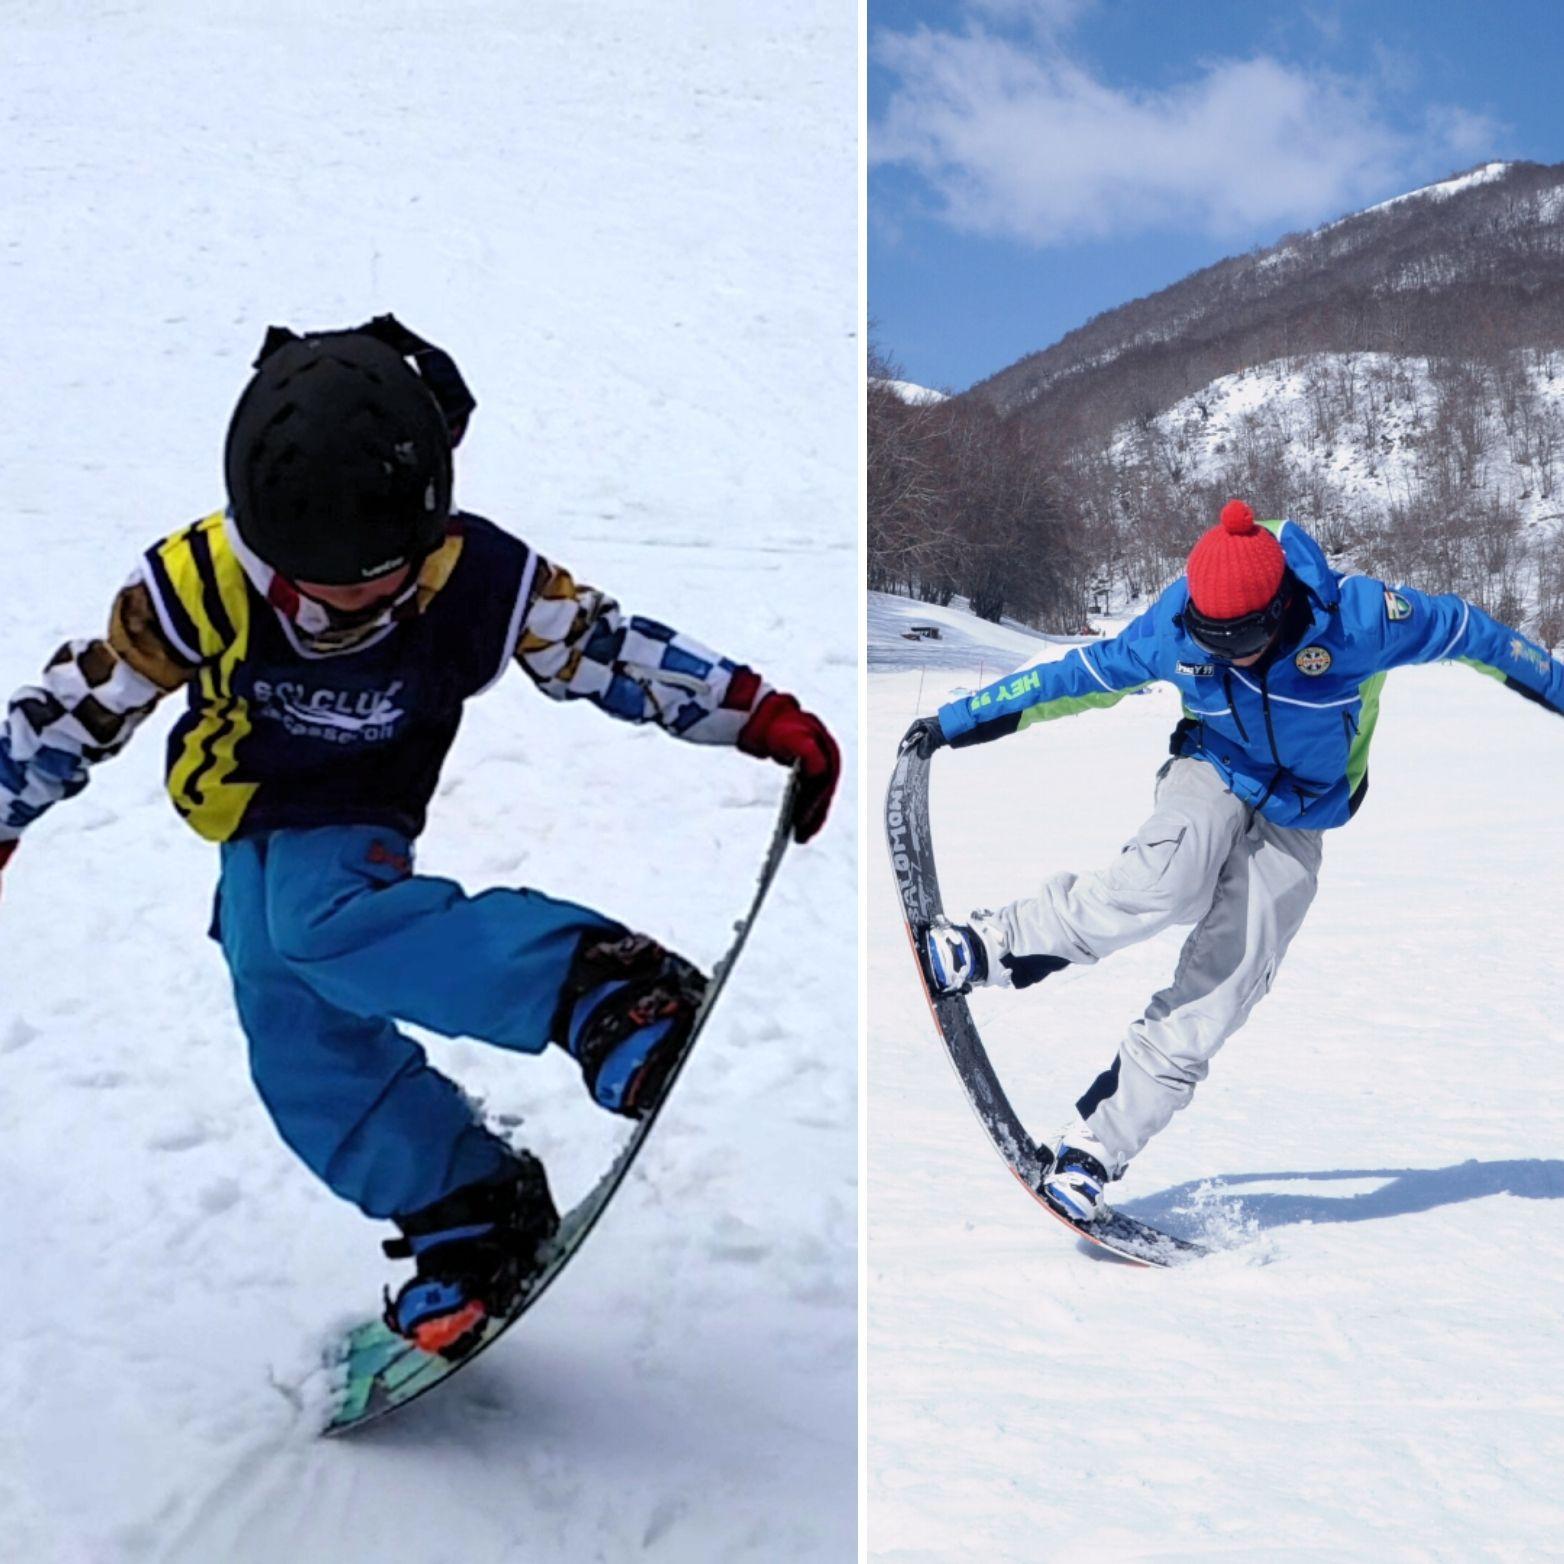 evolutionski-pescasseroli snowboard-abruzzo-1